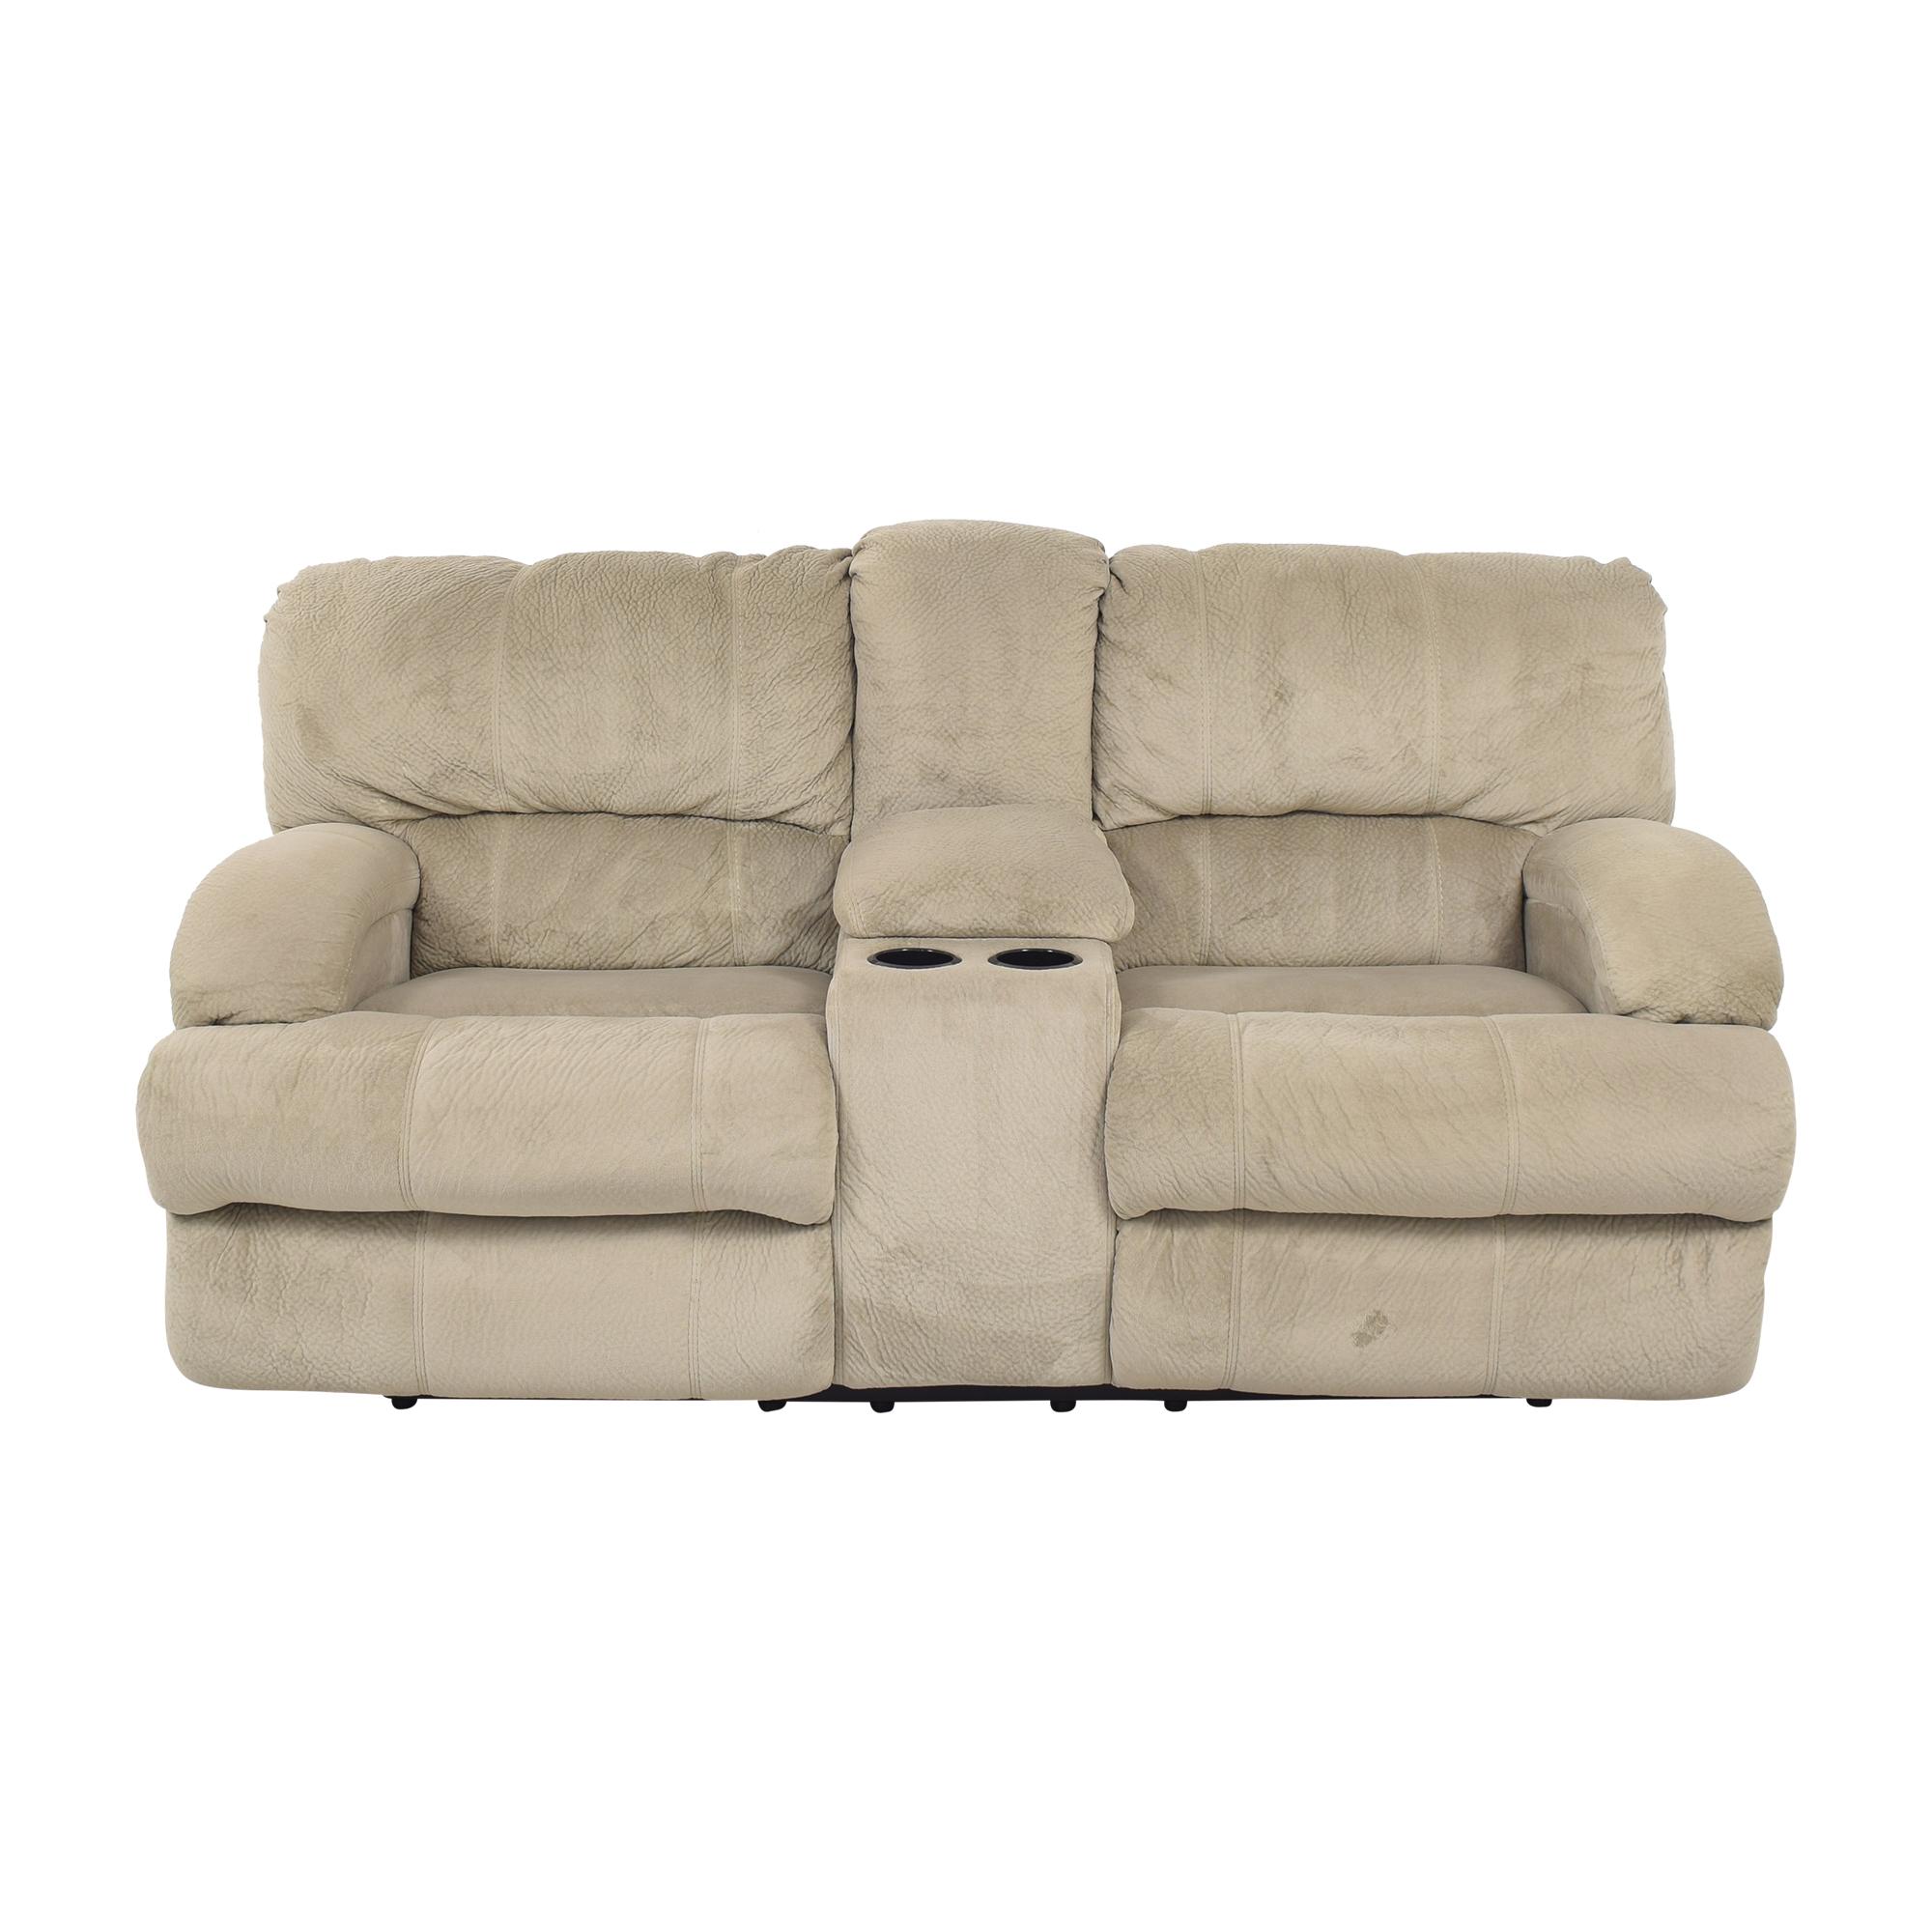 Raymour & Flanigan Microfiber Reclining Sofa / Classic Sofas